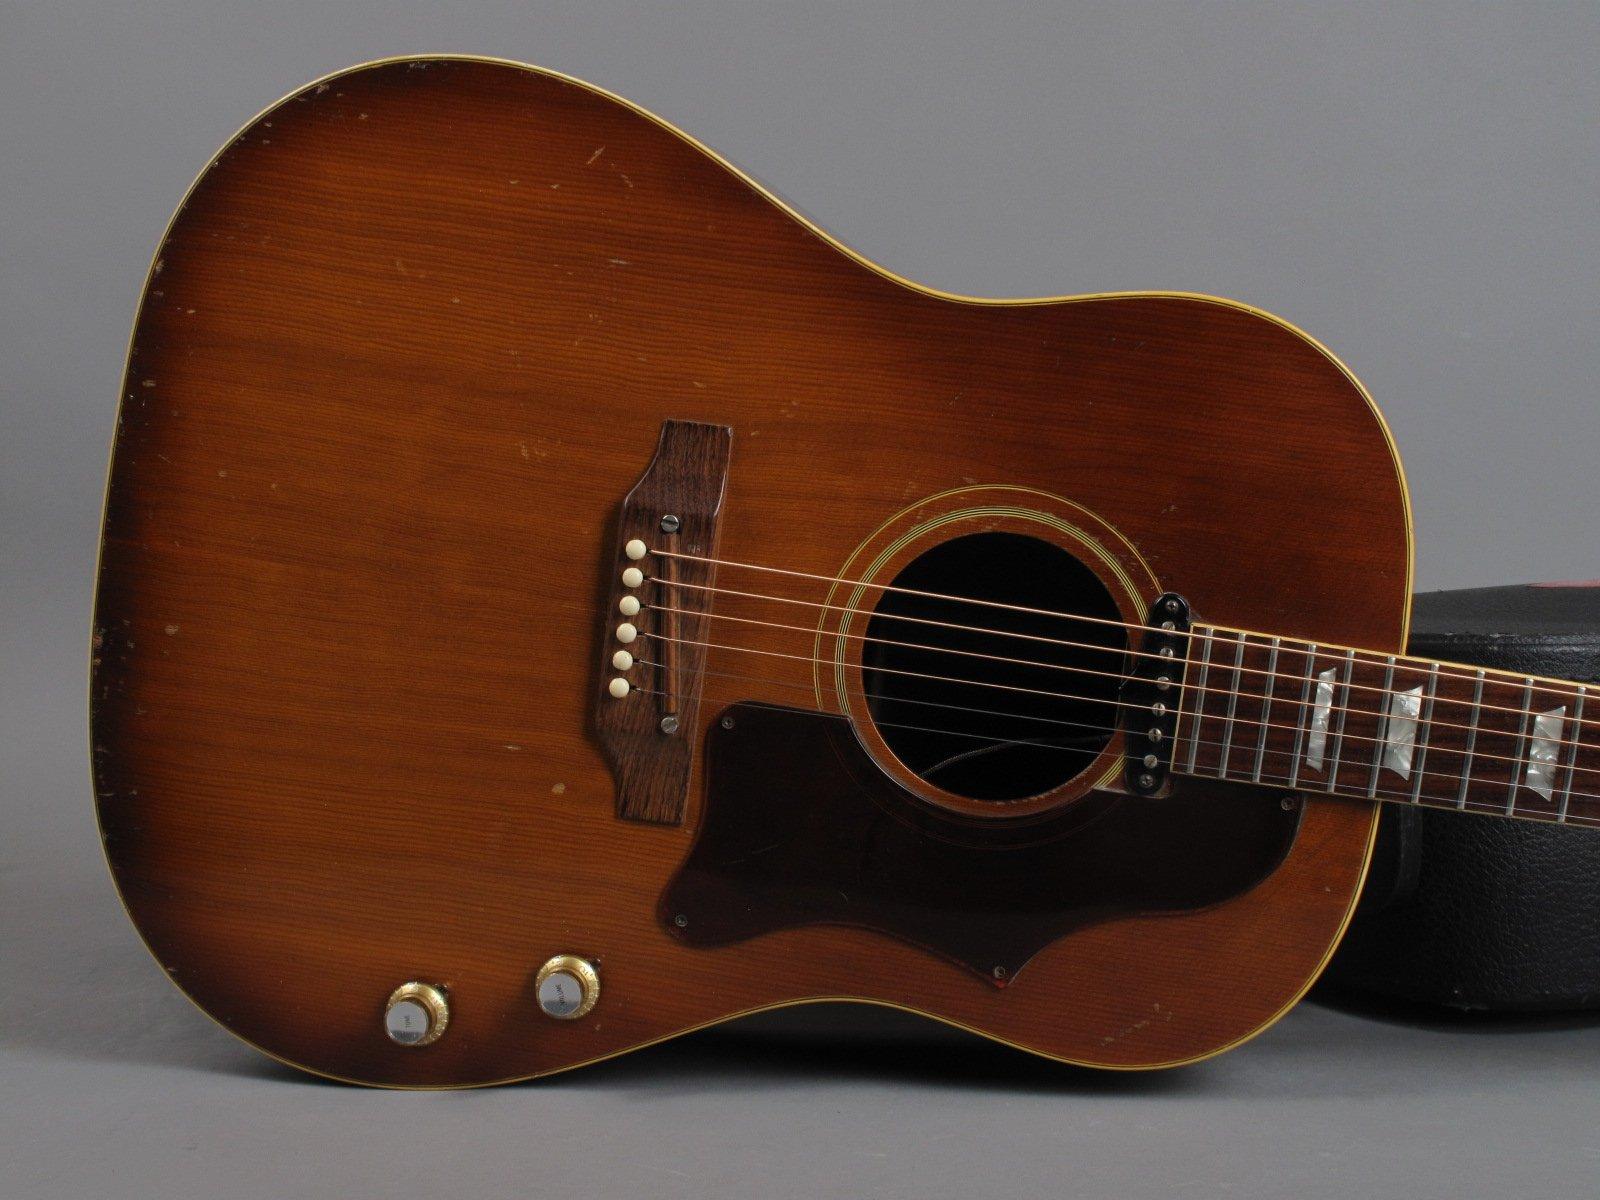 https://guitarpoint.de/app/uploads/products/1969-gibson-j-160e-sunburst/1969-Gibson-J160E-830439-10.jpg